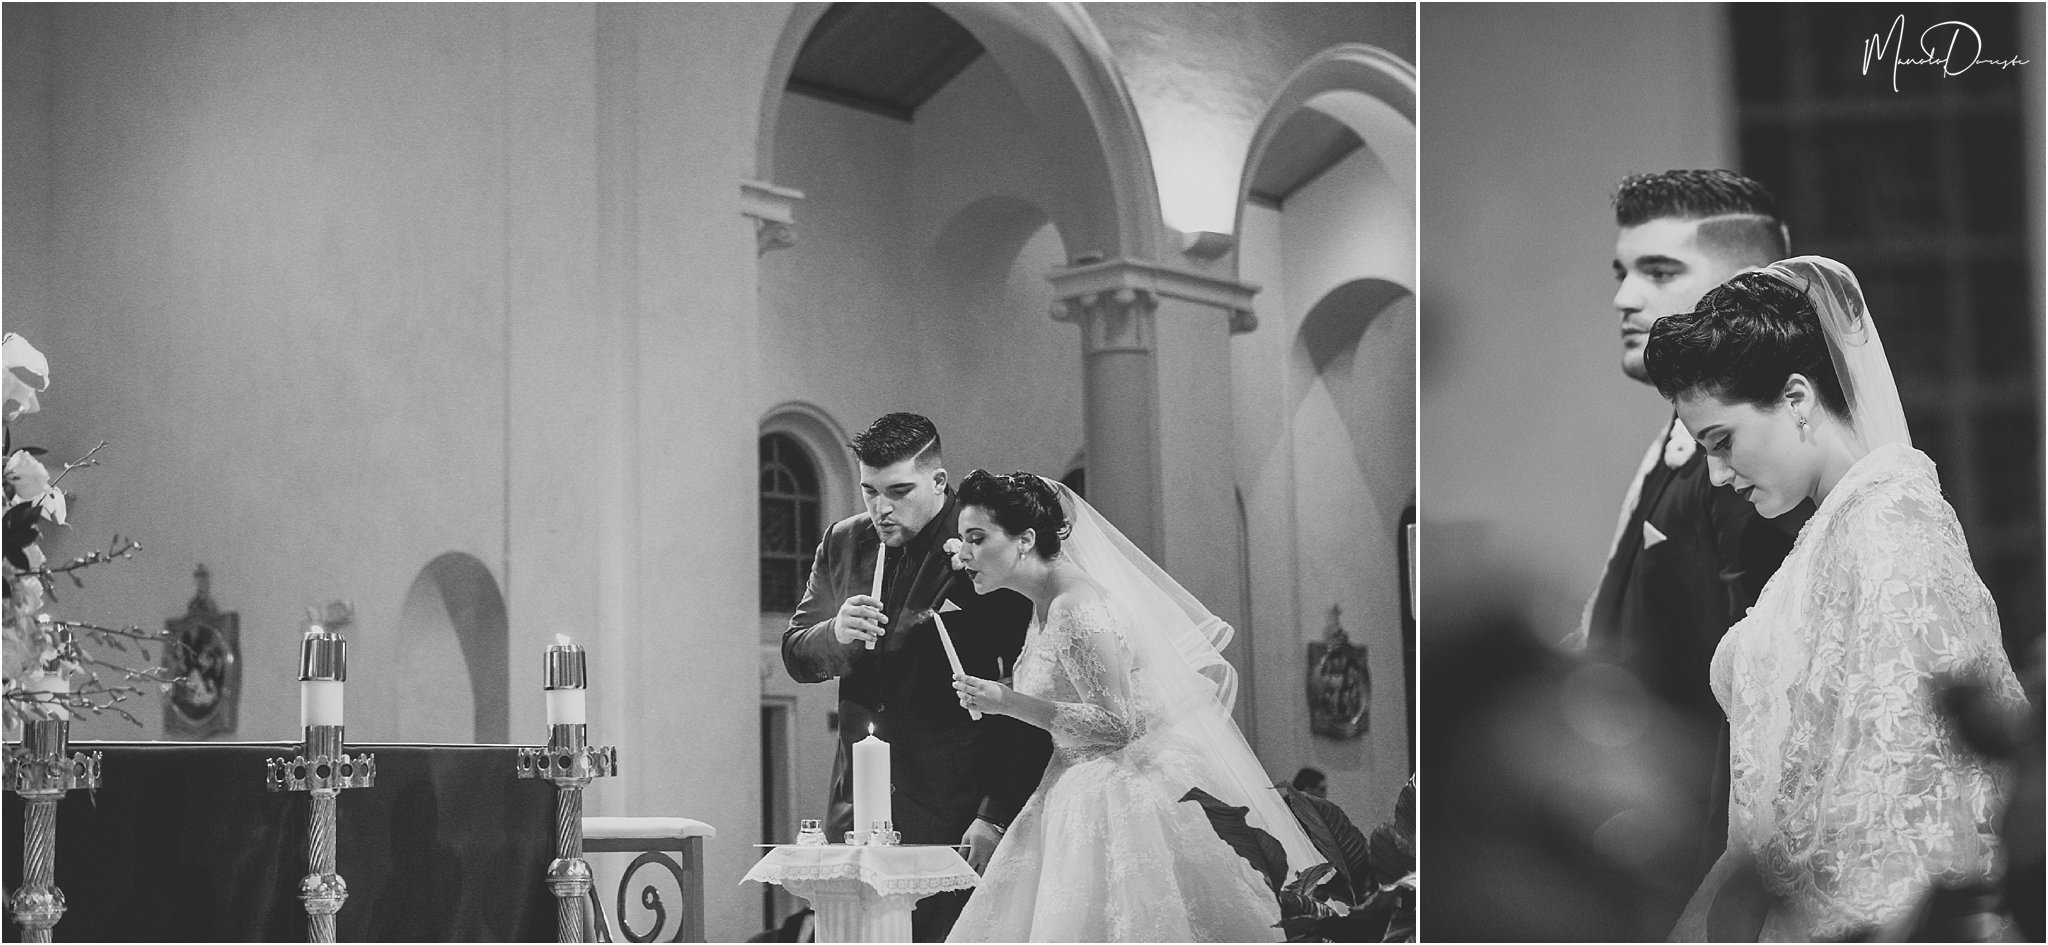 00962_ManoloDoreste_InFocusStudios_Wedding_Family_Photography_Miami_MiamiPhotographer.jpg